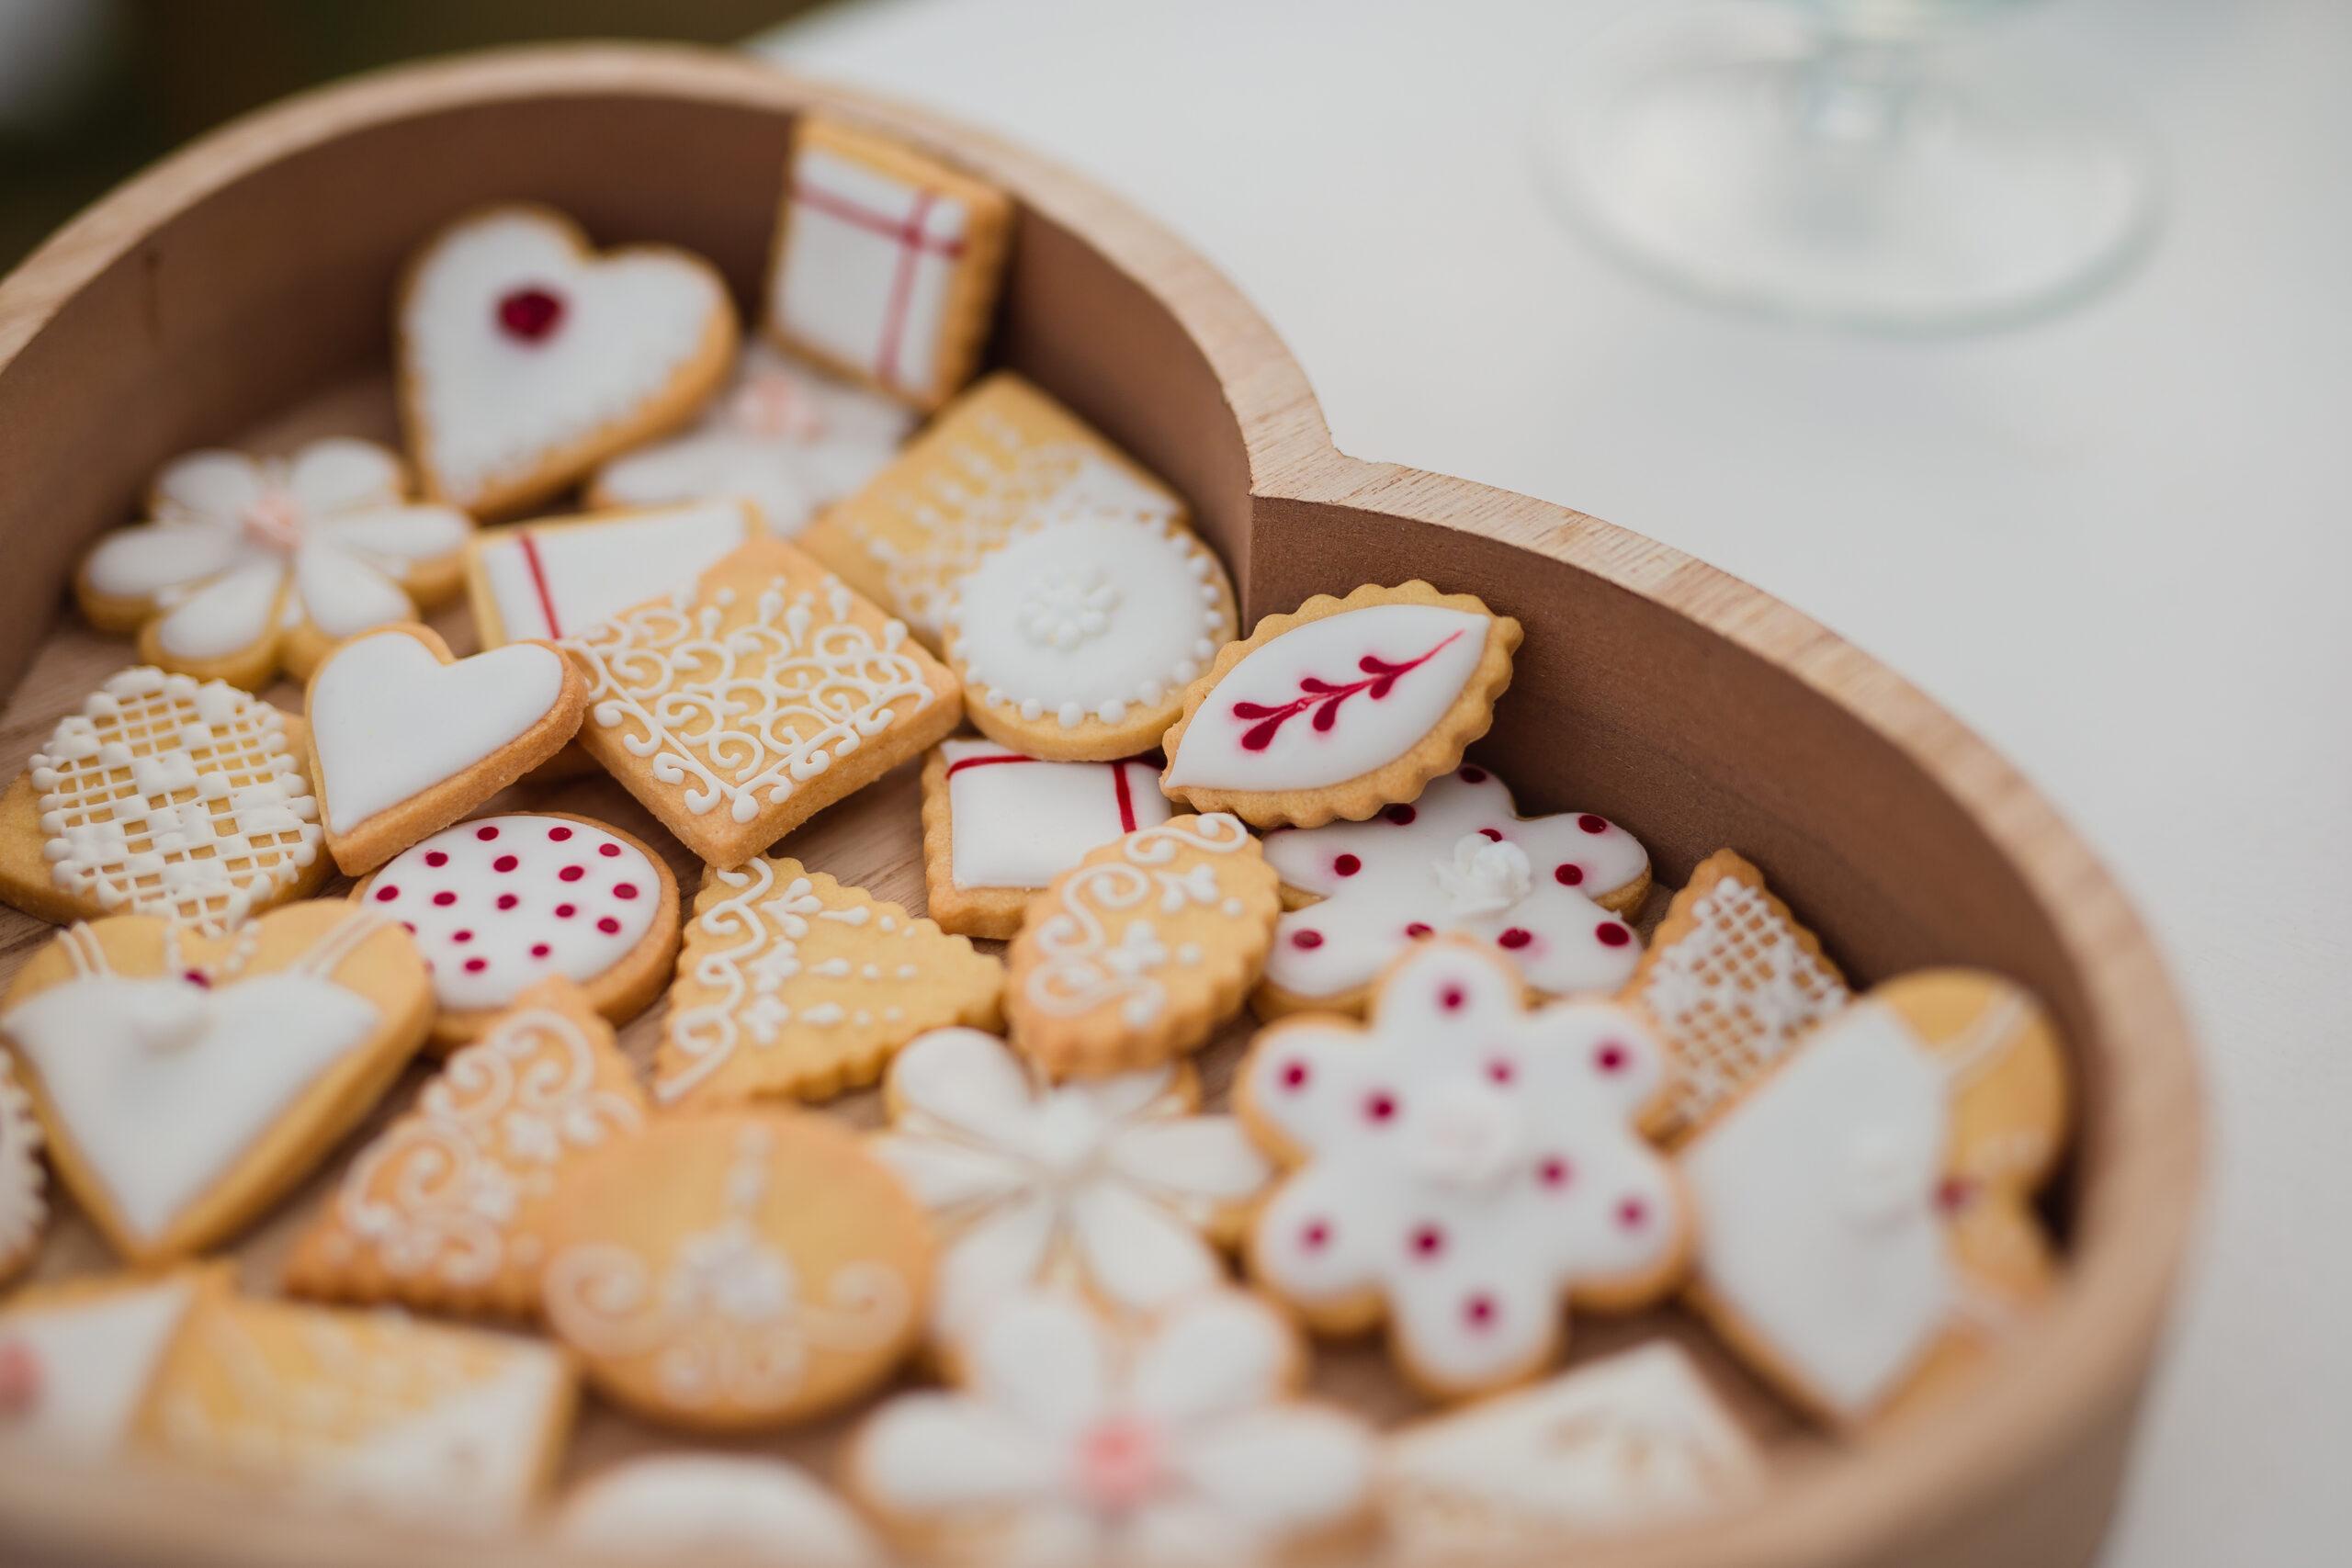 biscotti al ricevimento